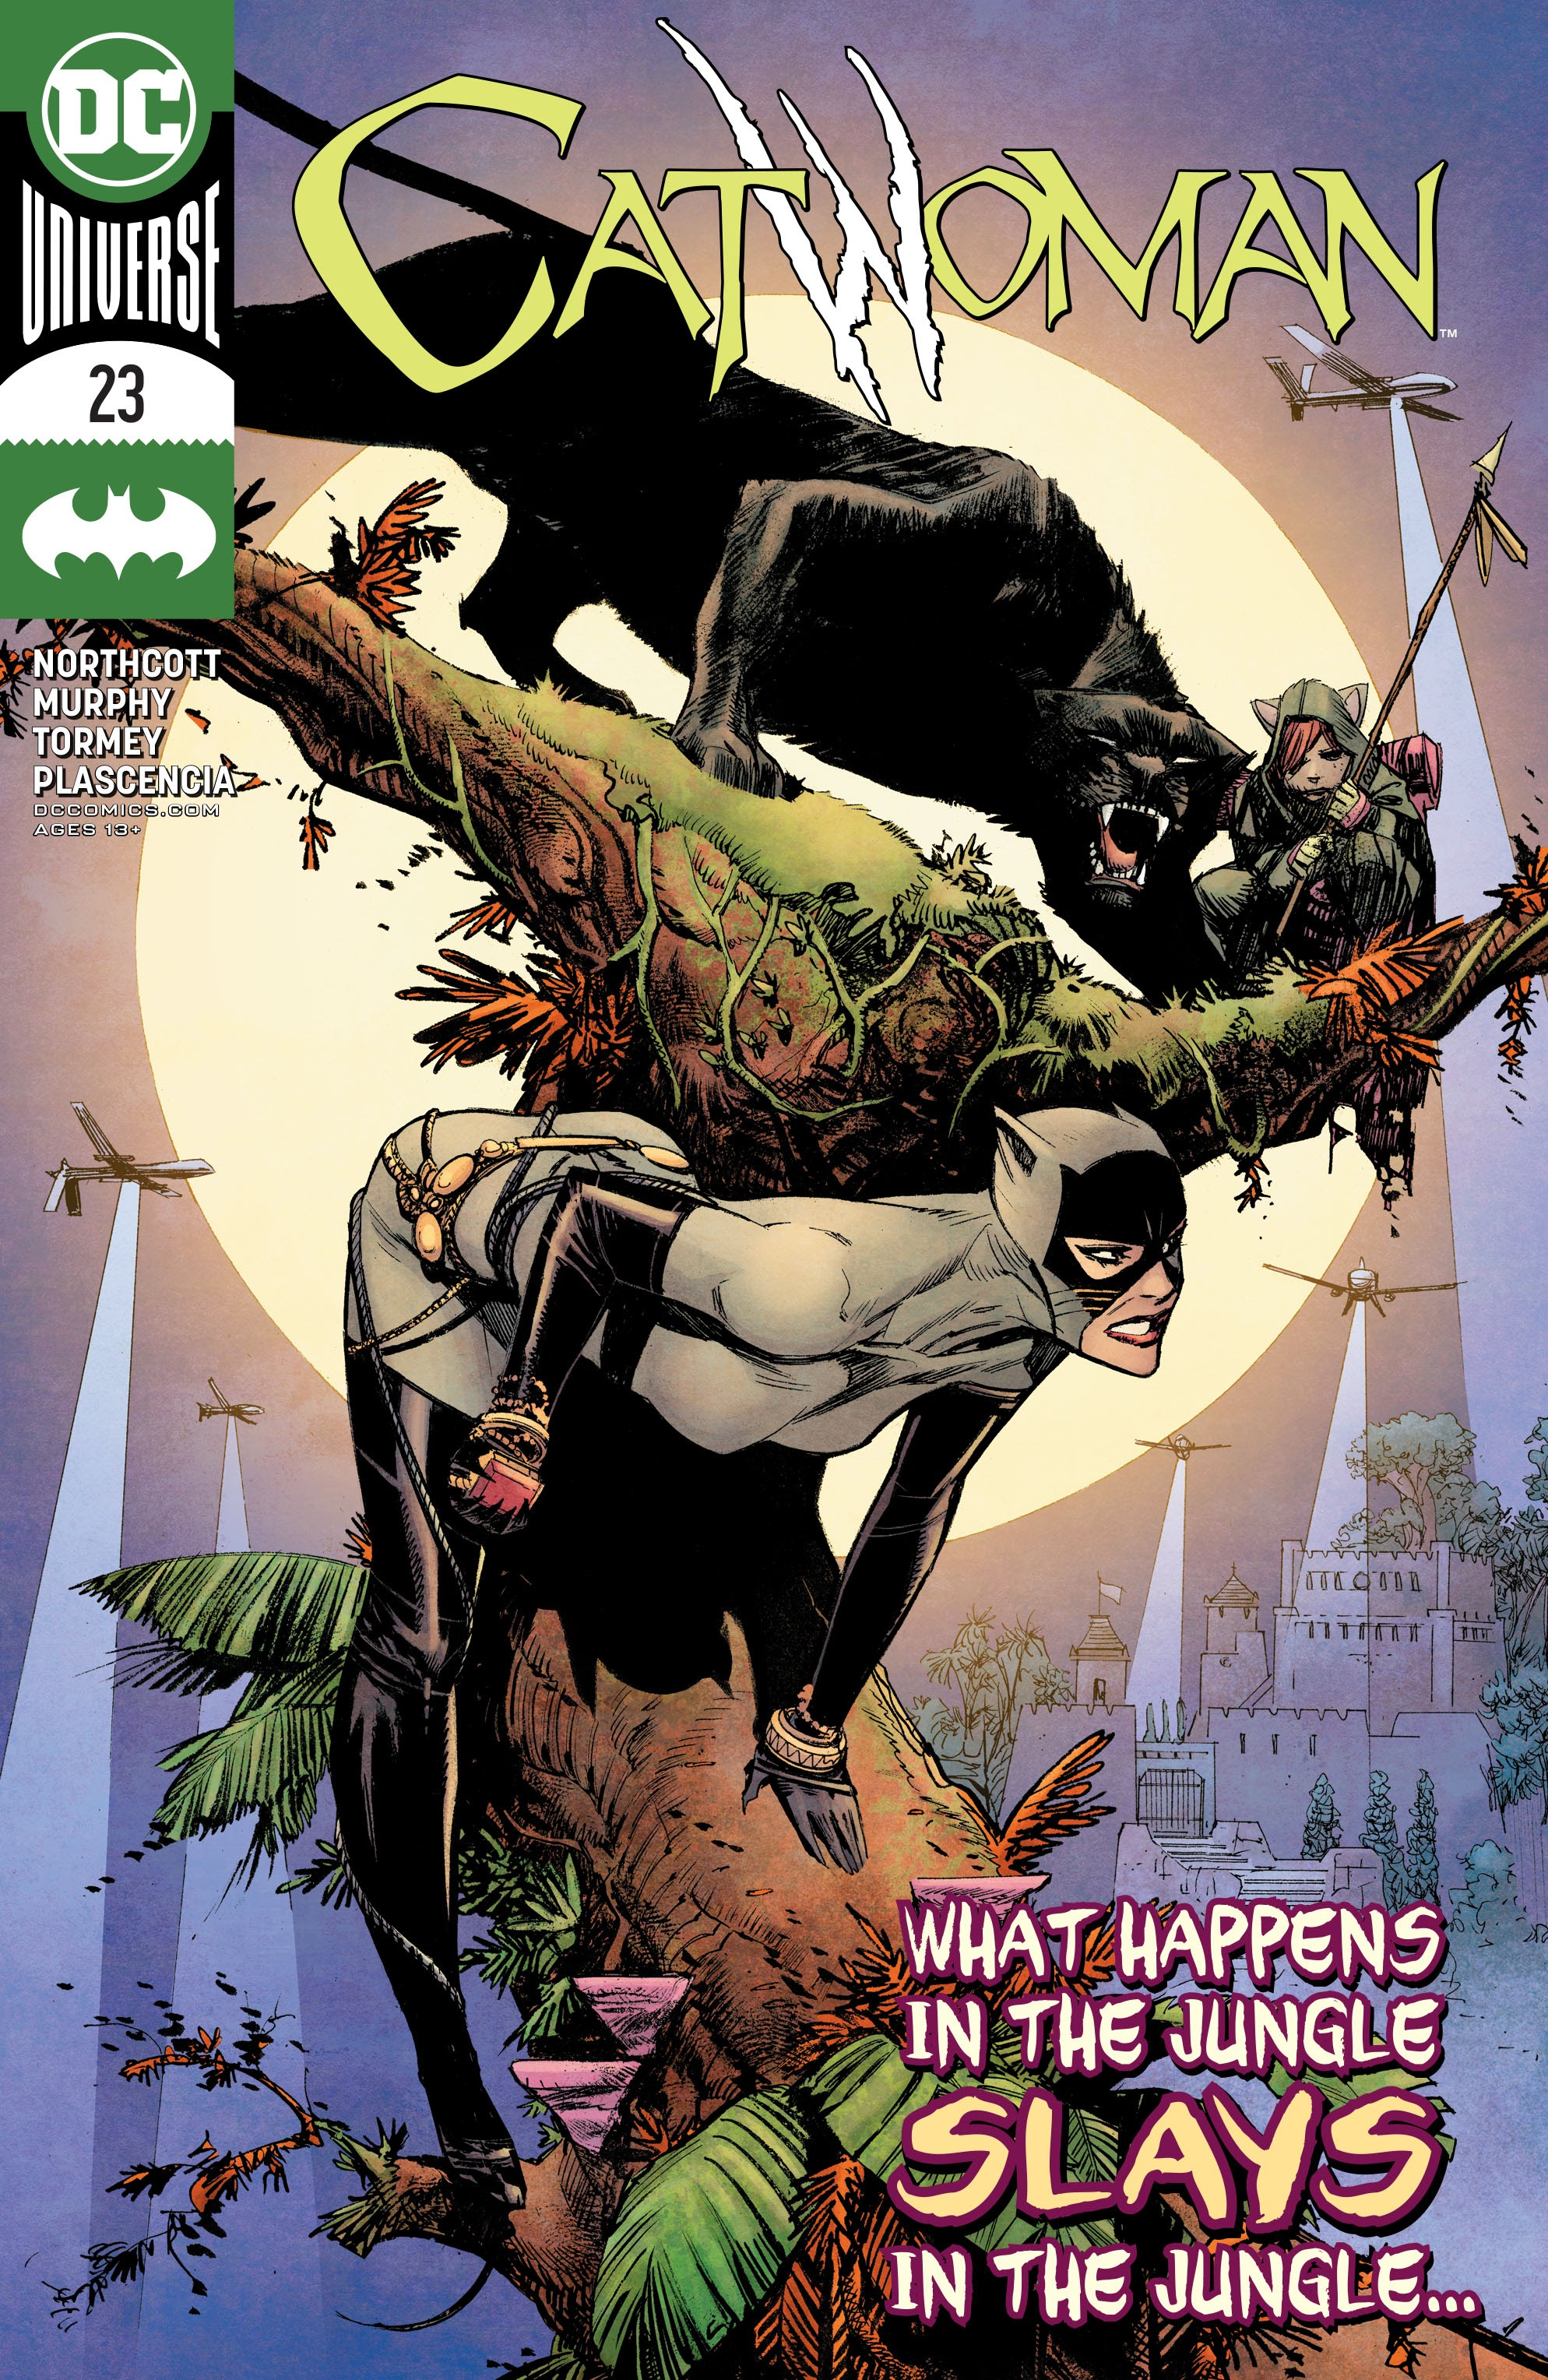 Catwoman Vol 5 23